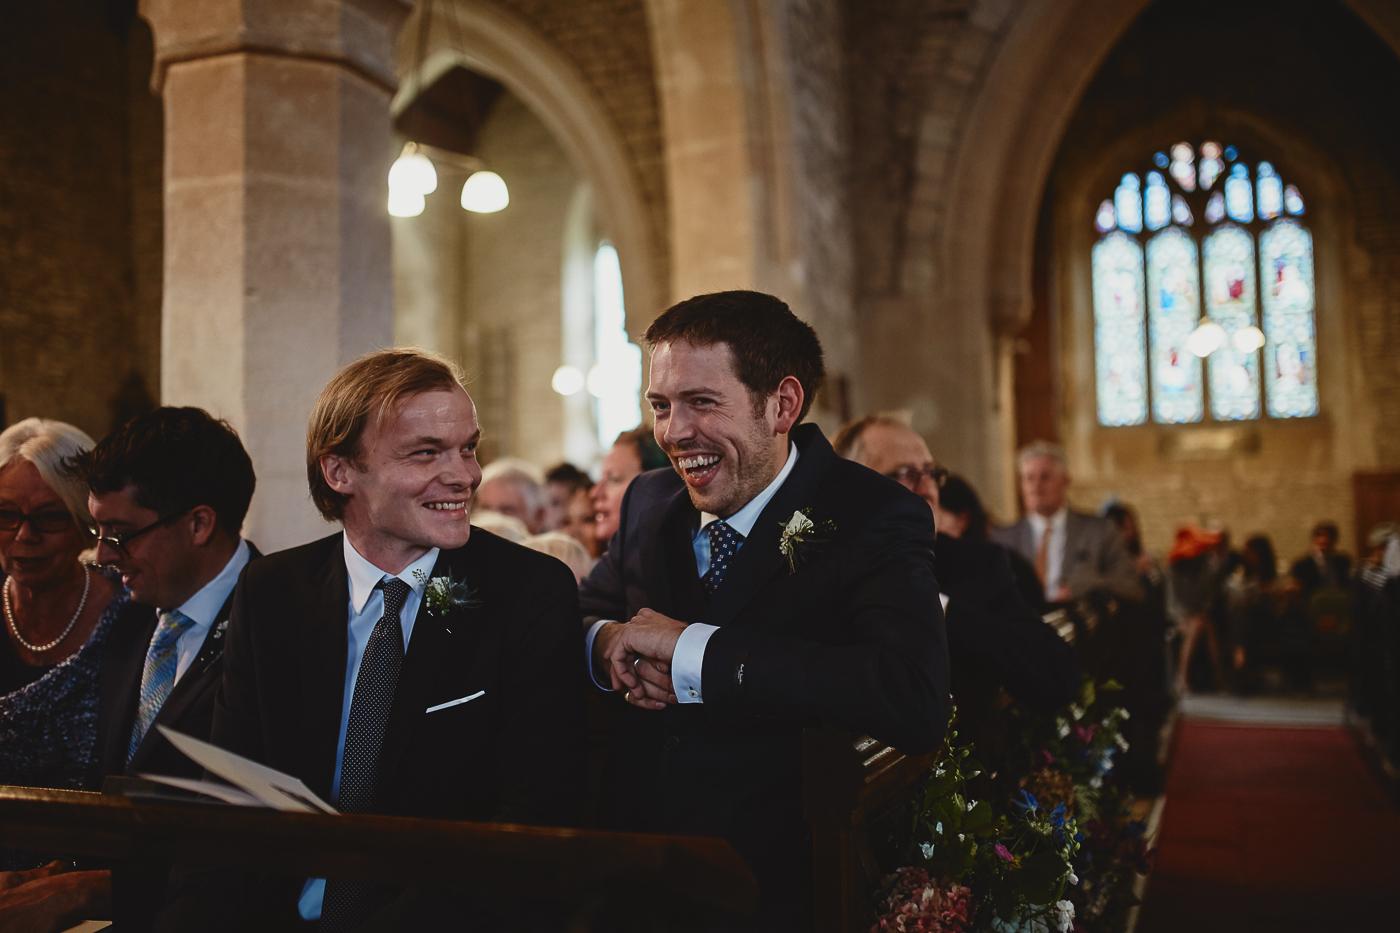 Danni_And_Jack_Gloucester_Wedding-62.jpg